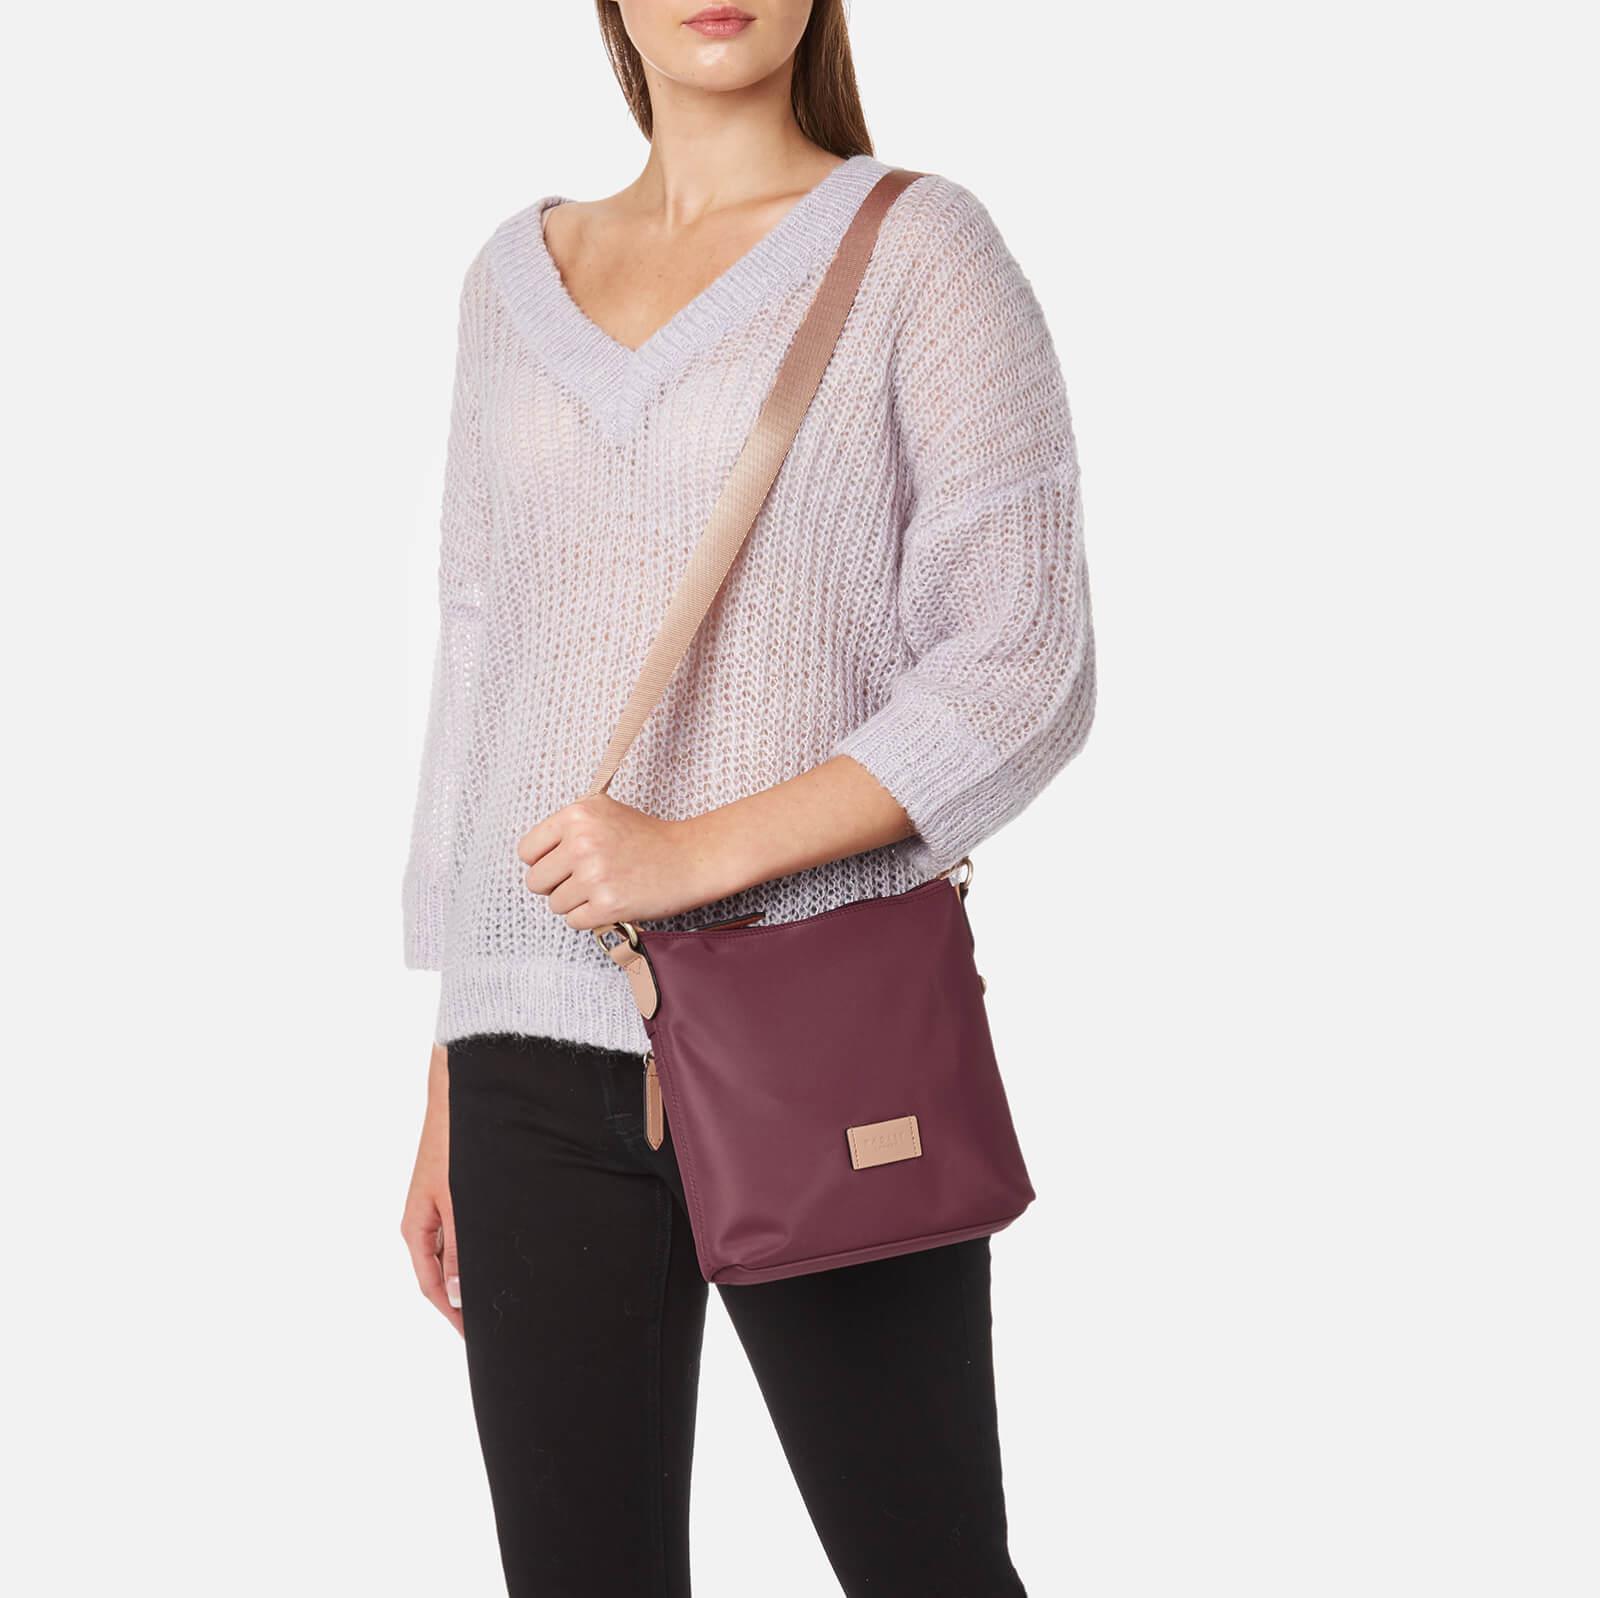 e45f0ca2cb Lyst - Radley Pocket Essentials Small Ziptop Cross Body Bag in Purple